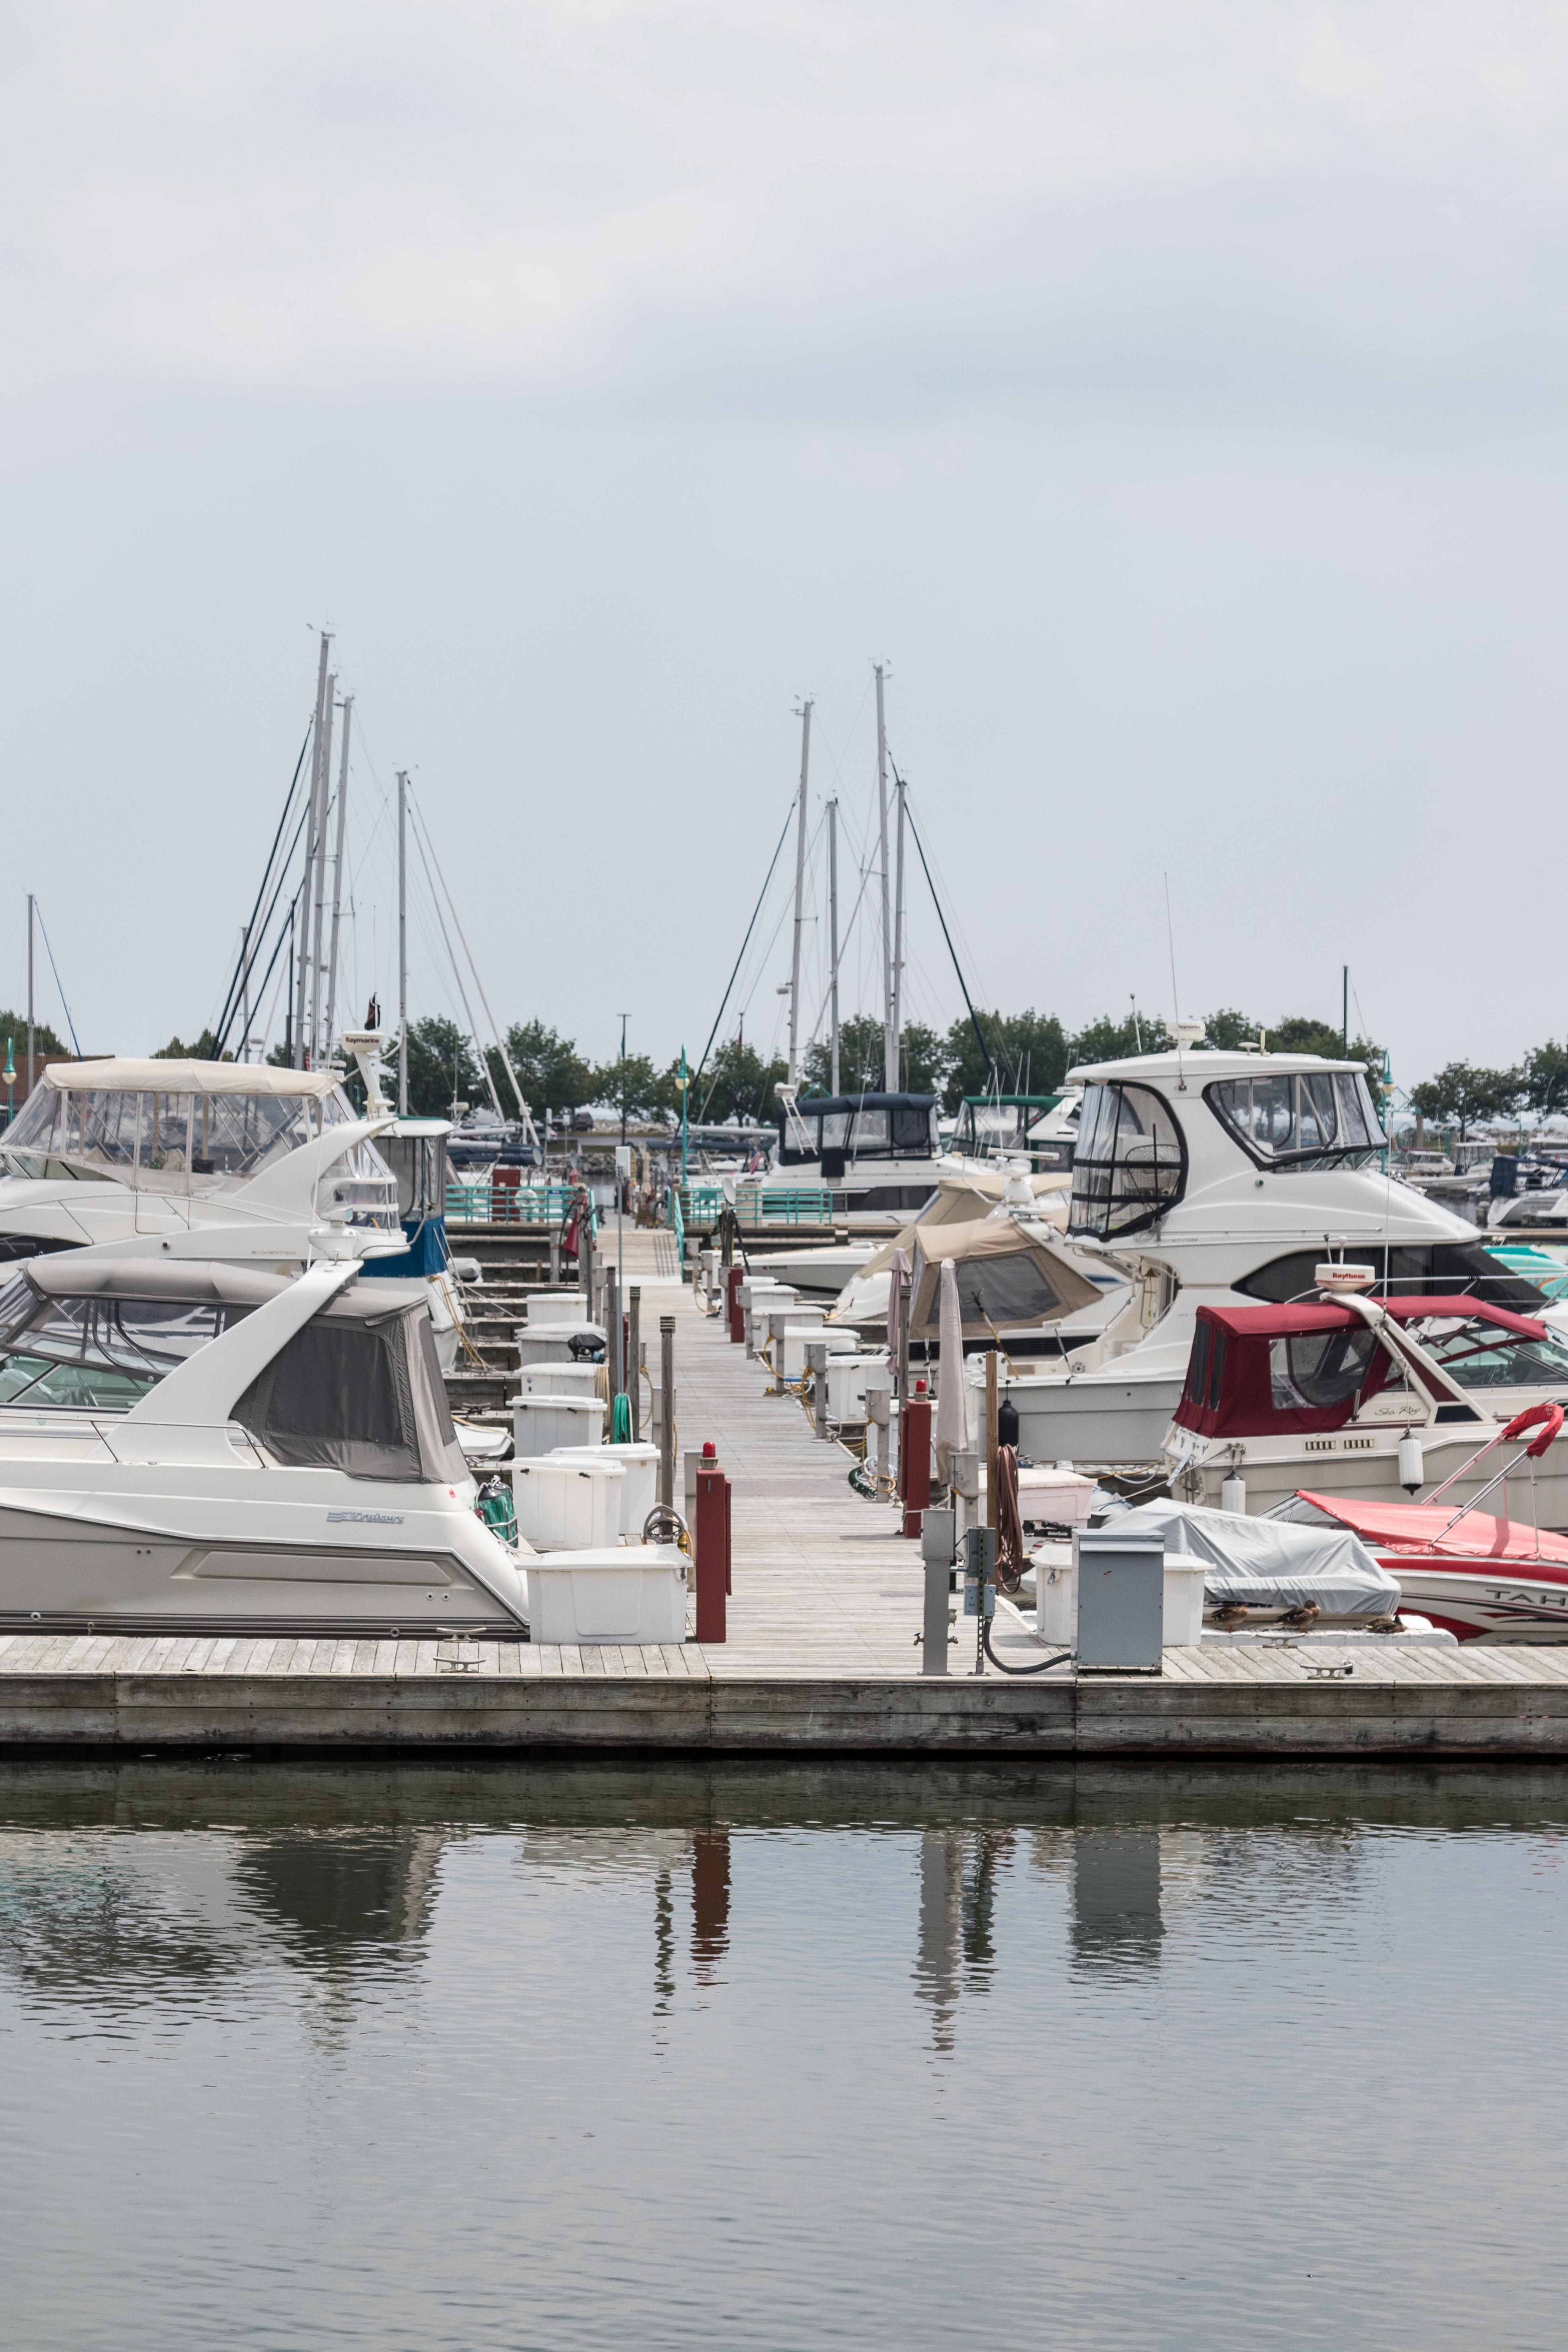 Downtown Racine, Wisconsin Harbor #harbor #boats #Wisconsin | https://www.roseclearfield.com